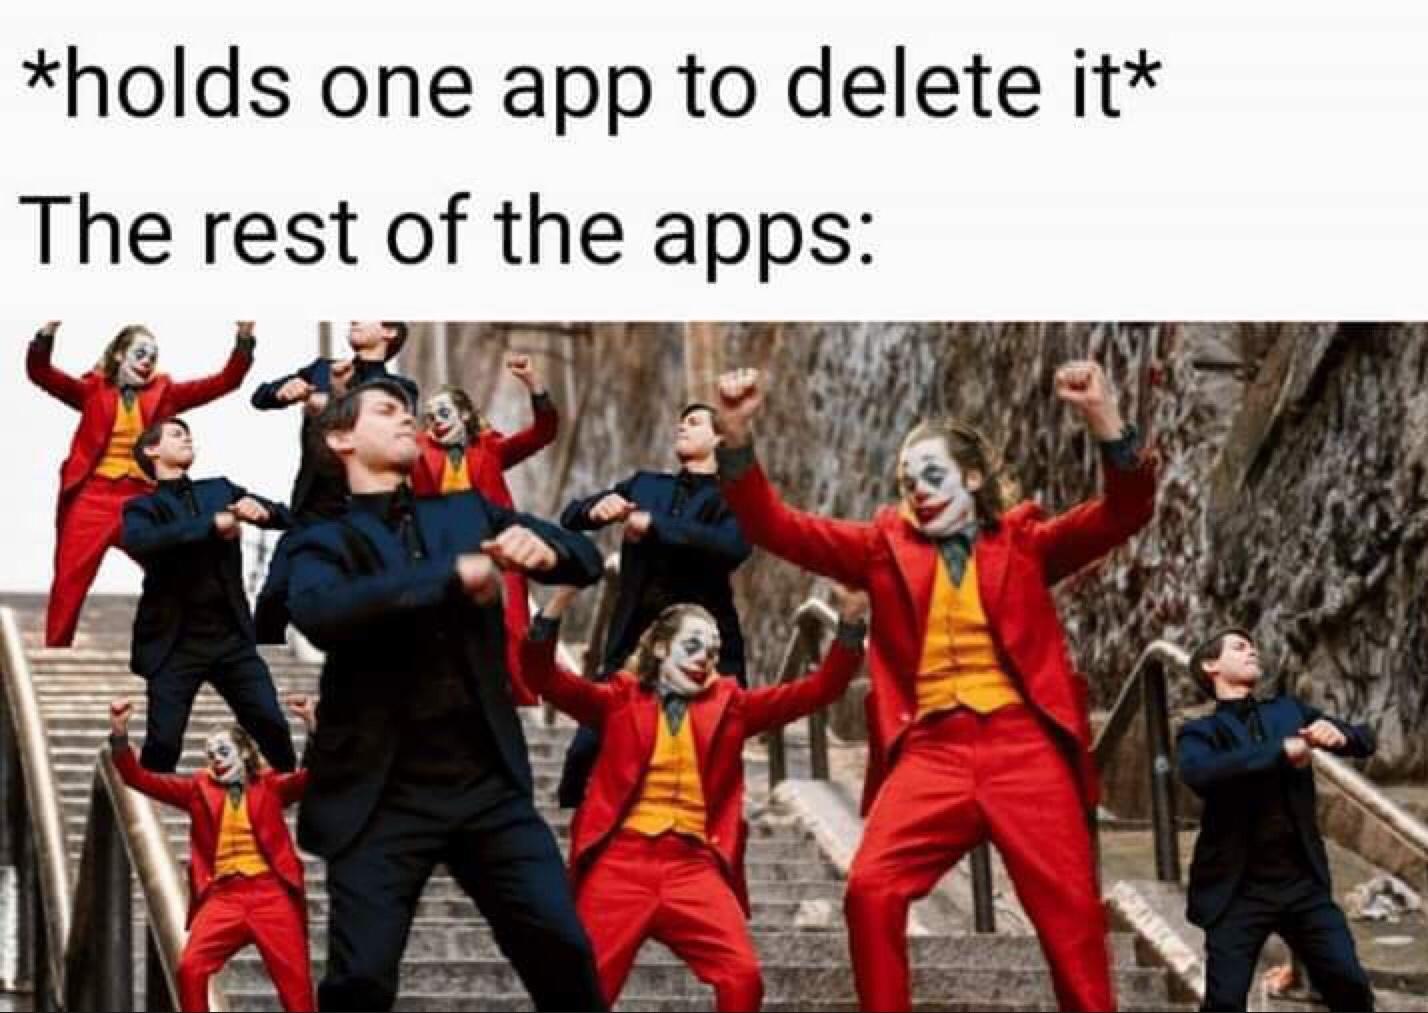 Shake that - meme